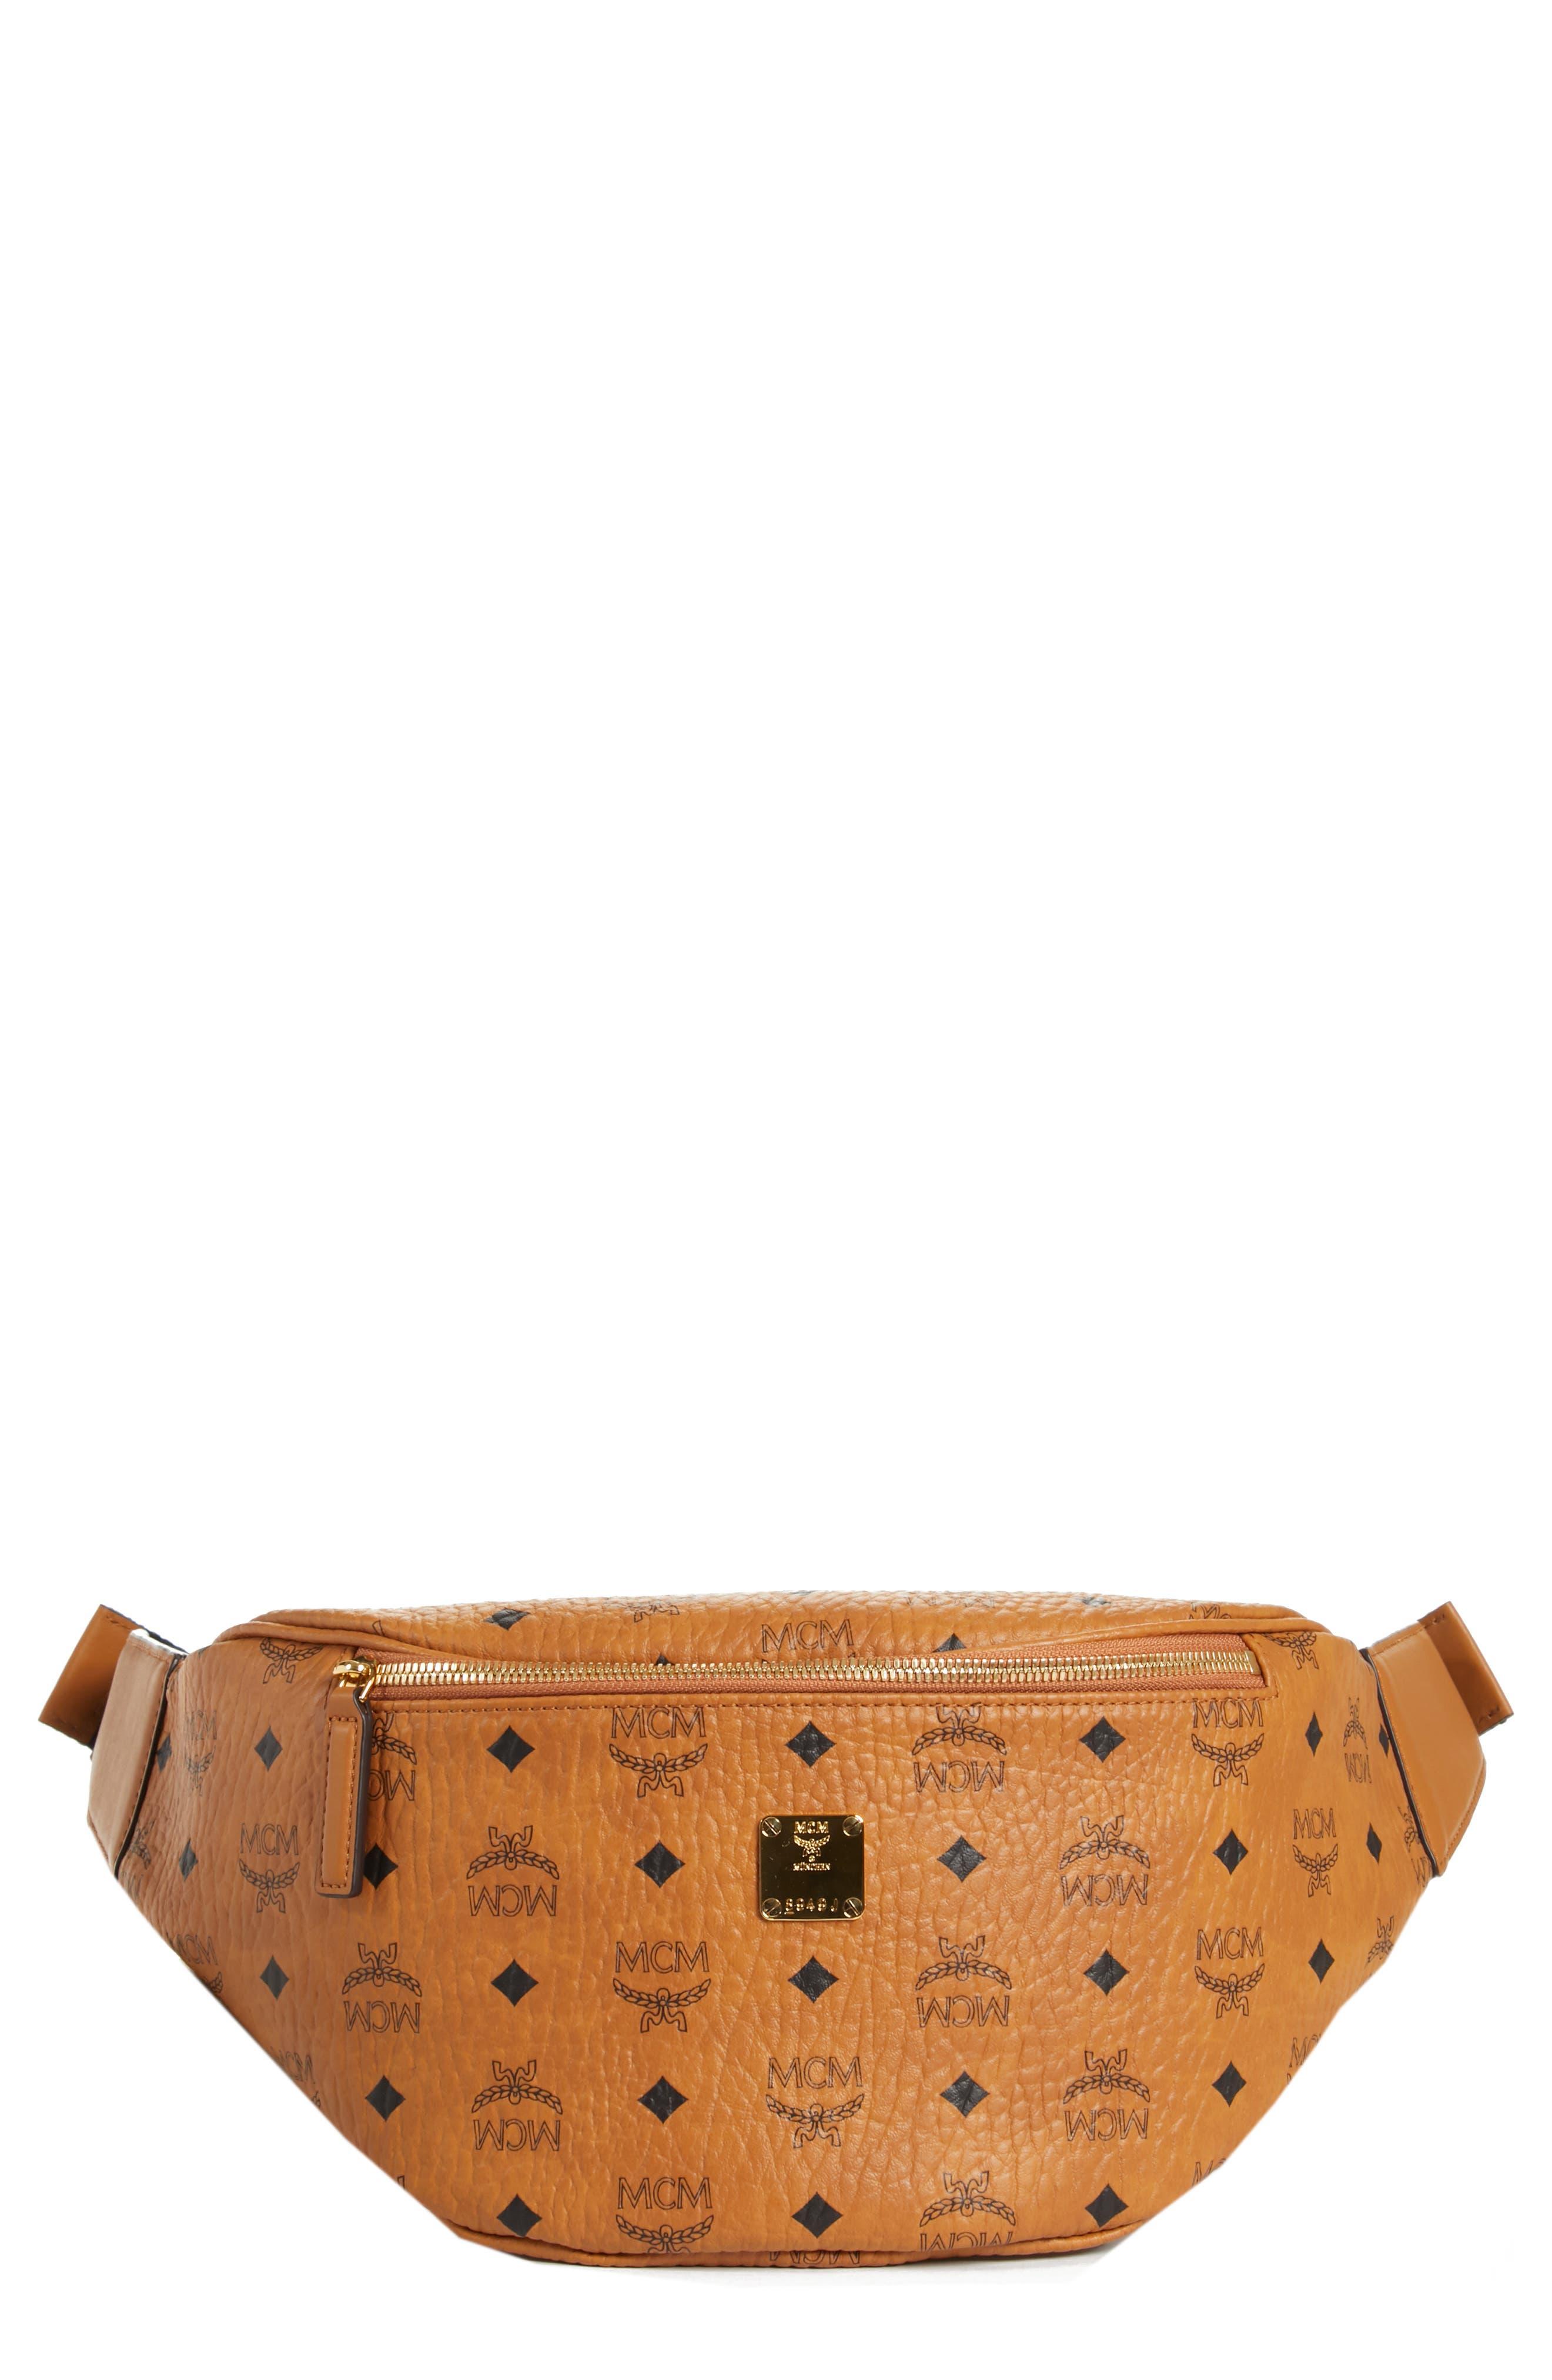 Medium Stark Belt Bag,                             Main thumbnail 1, color,                             Cognac Co